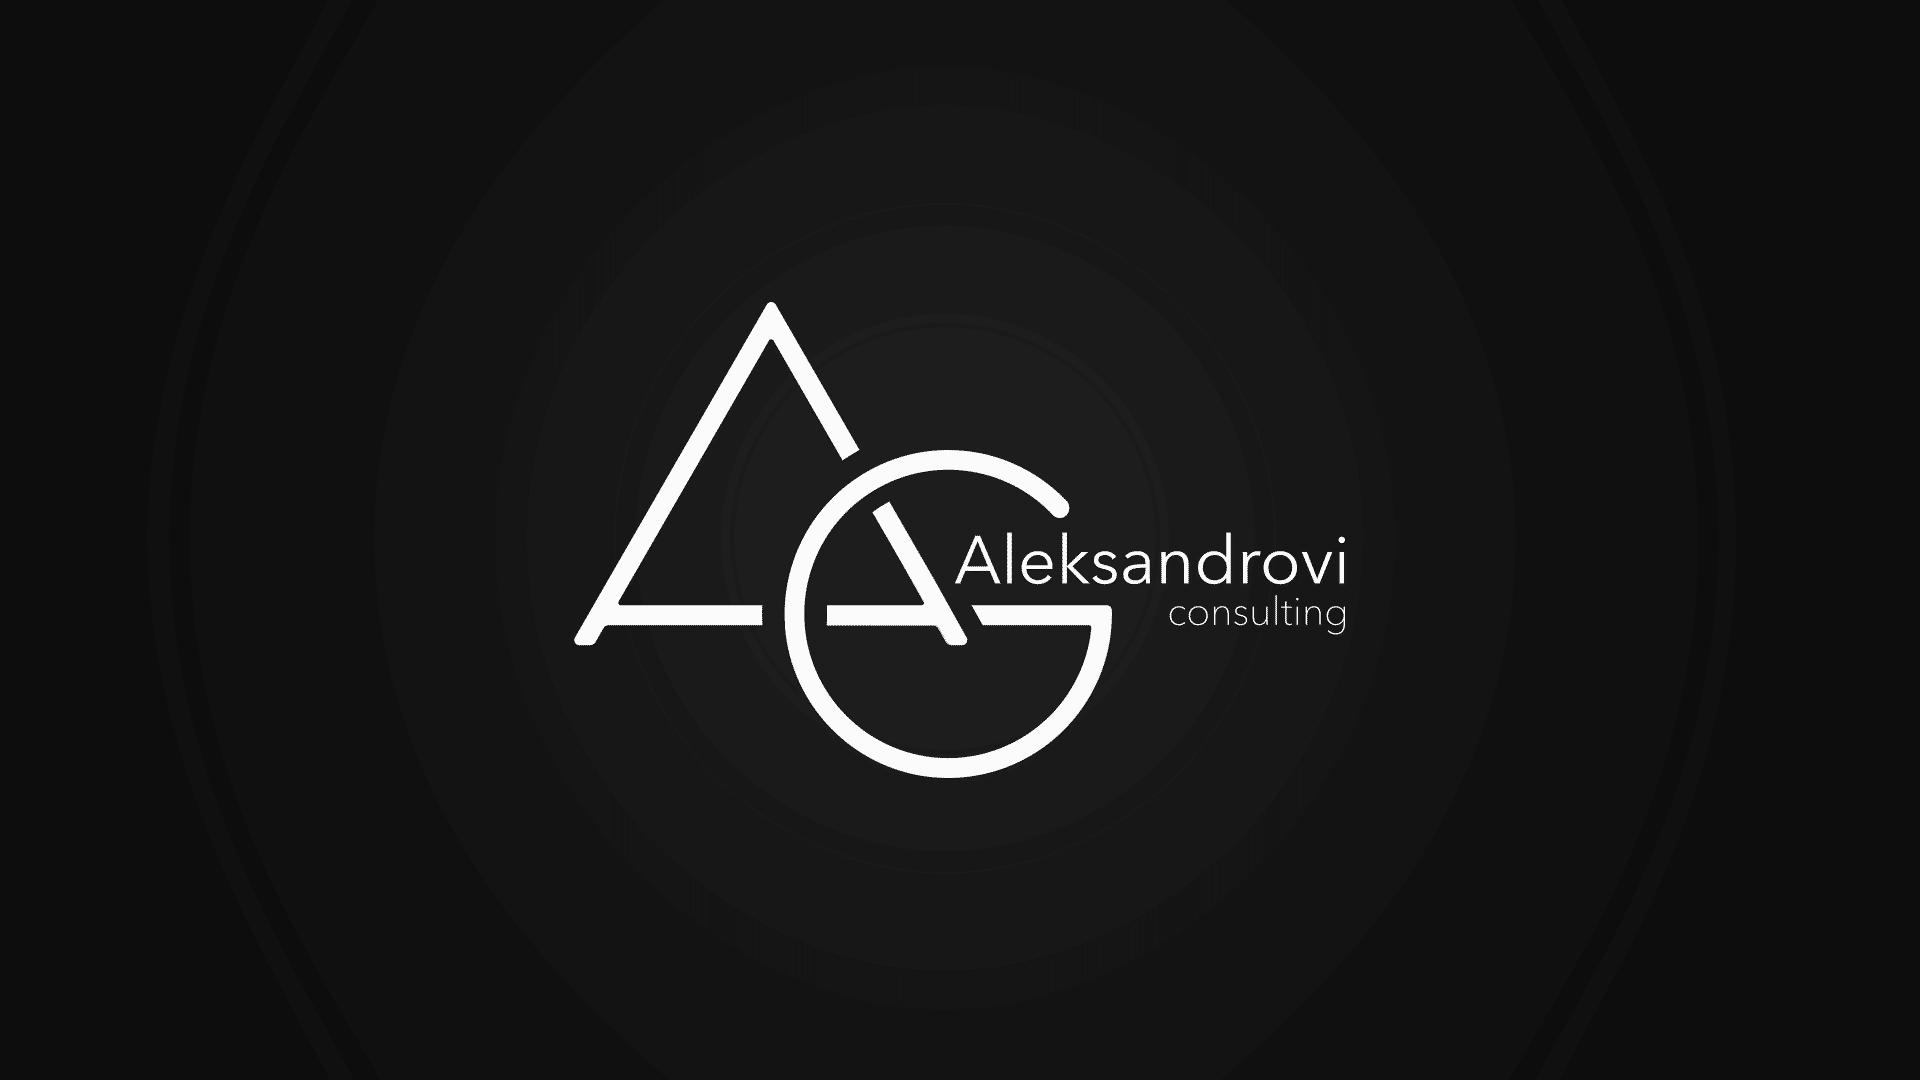 aleksandrovi consulting logo design